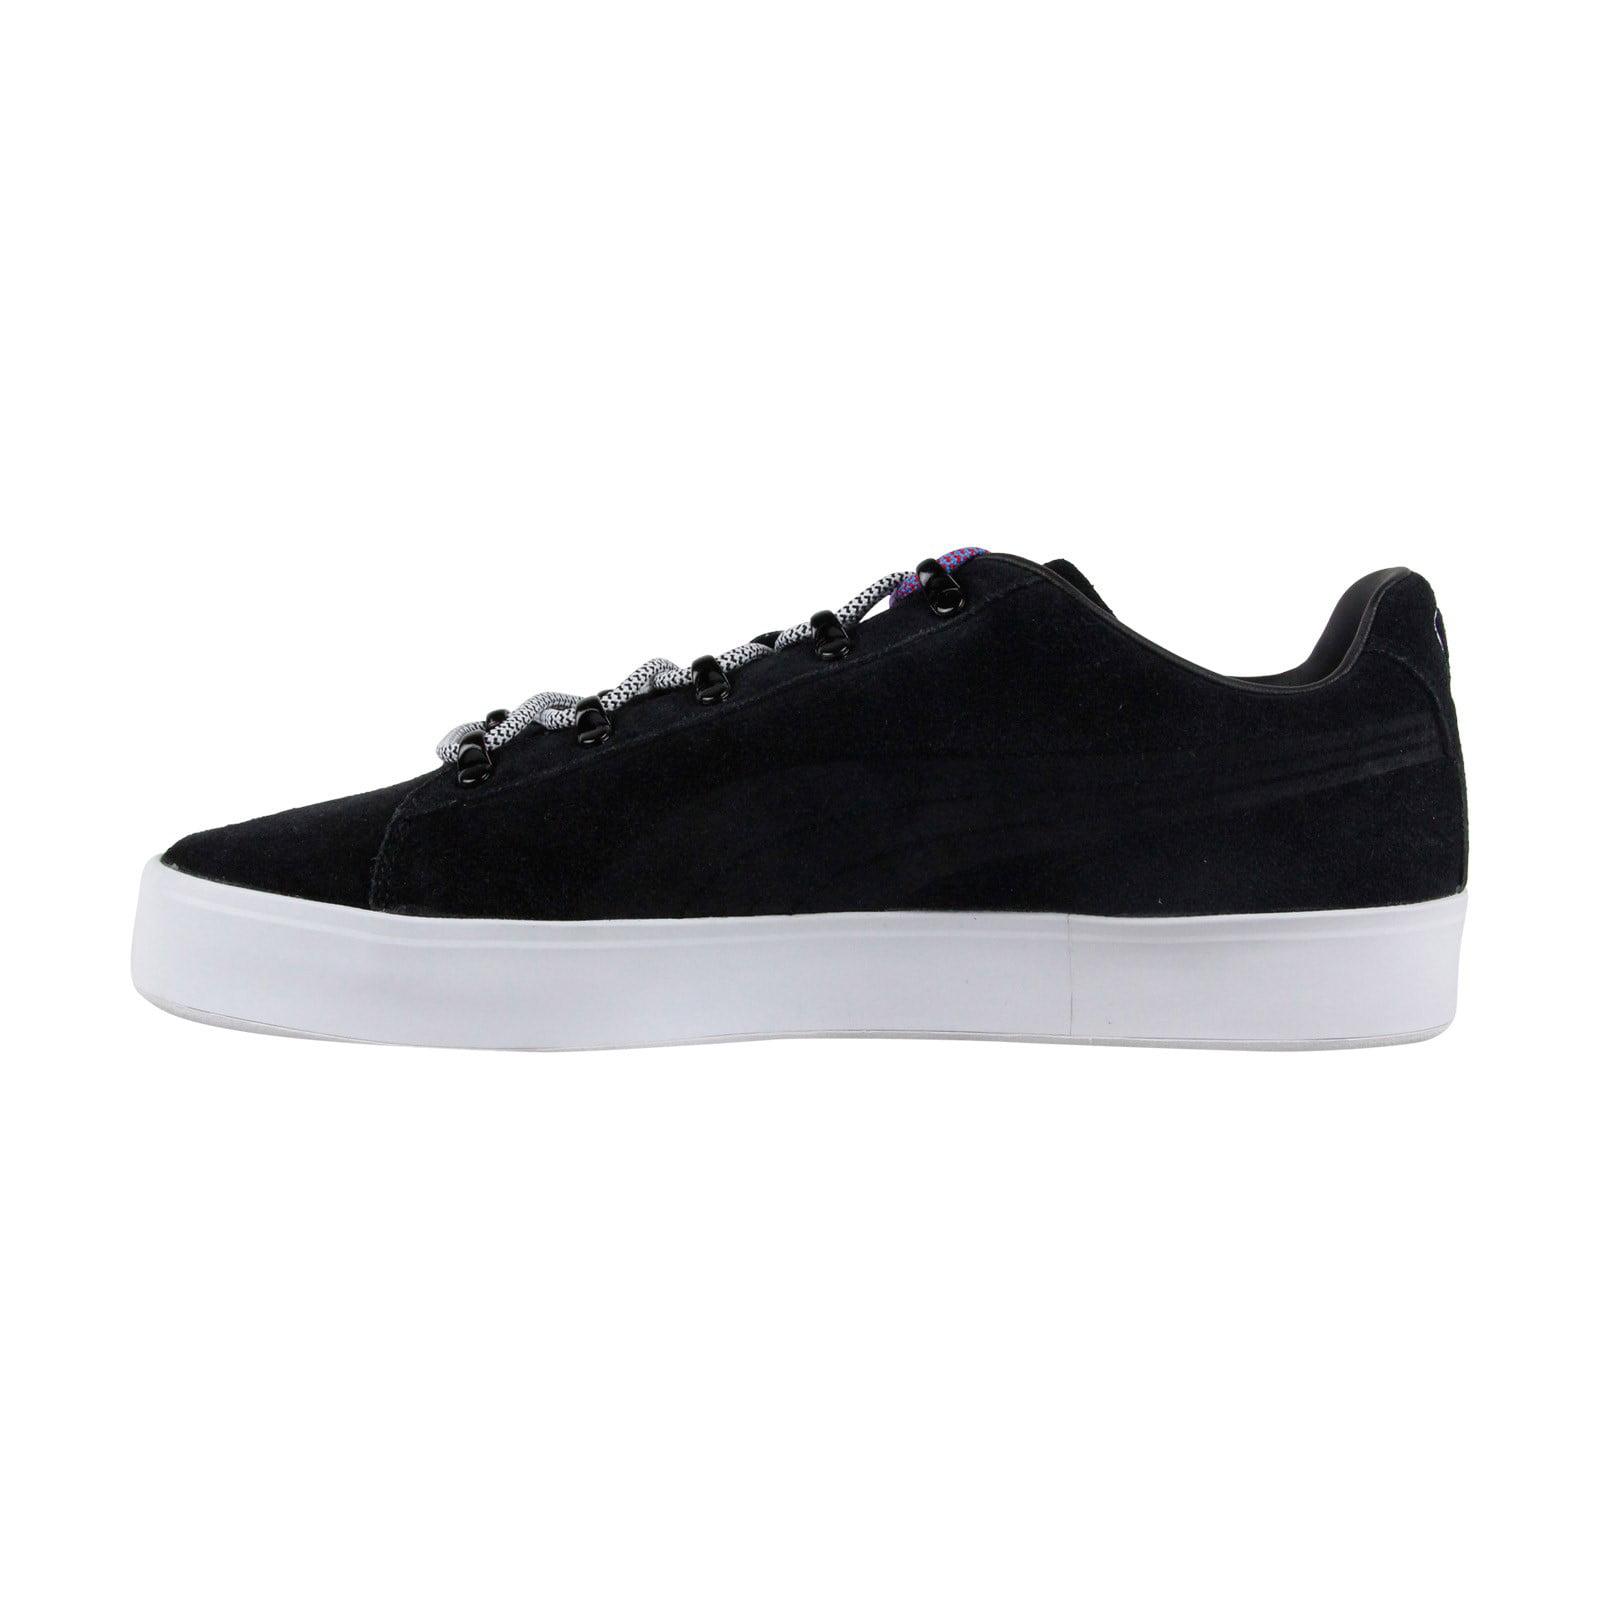 Puma Men's X Dp Court Platform S Black Ankle-High Fashion Sneaker - 11M